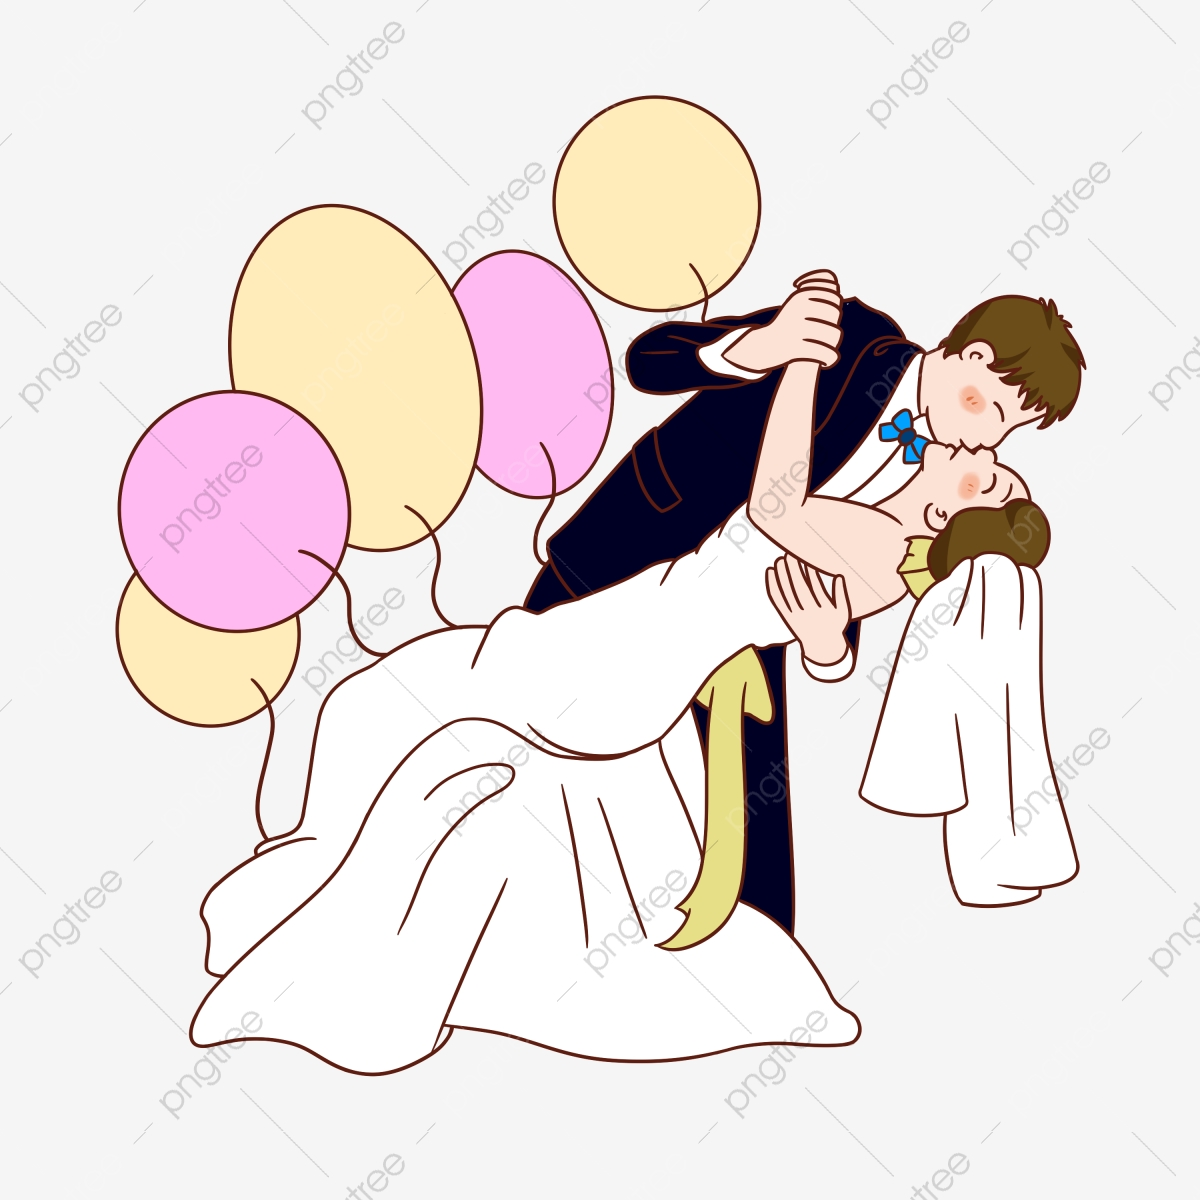 Perkahwinan Kejadian Ciuman Tangan Ditarik Ilustrasi Watak